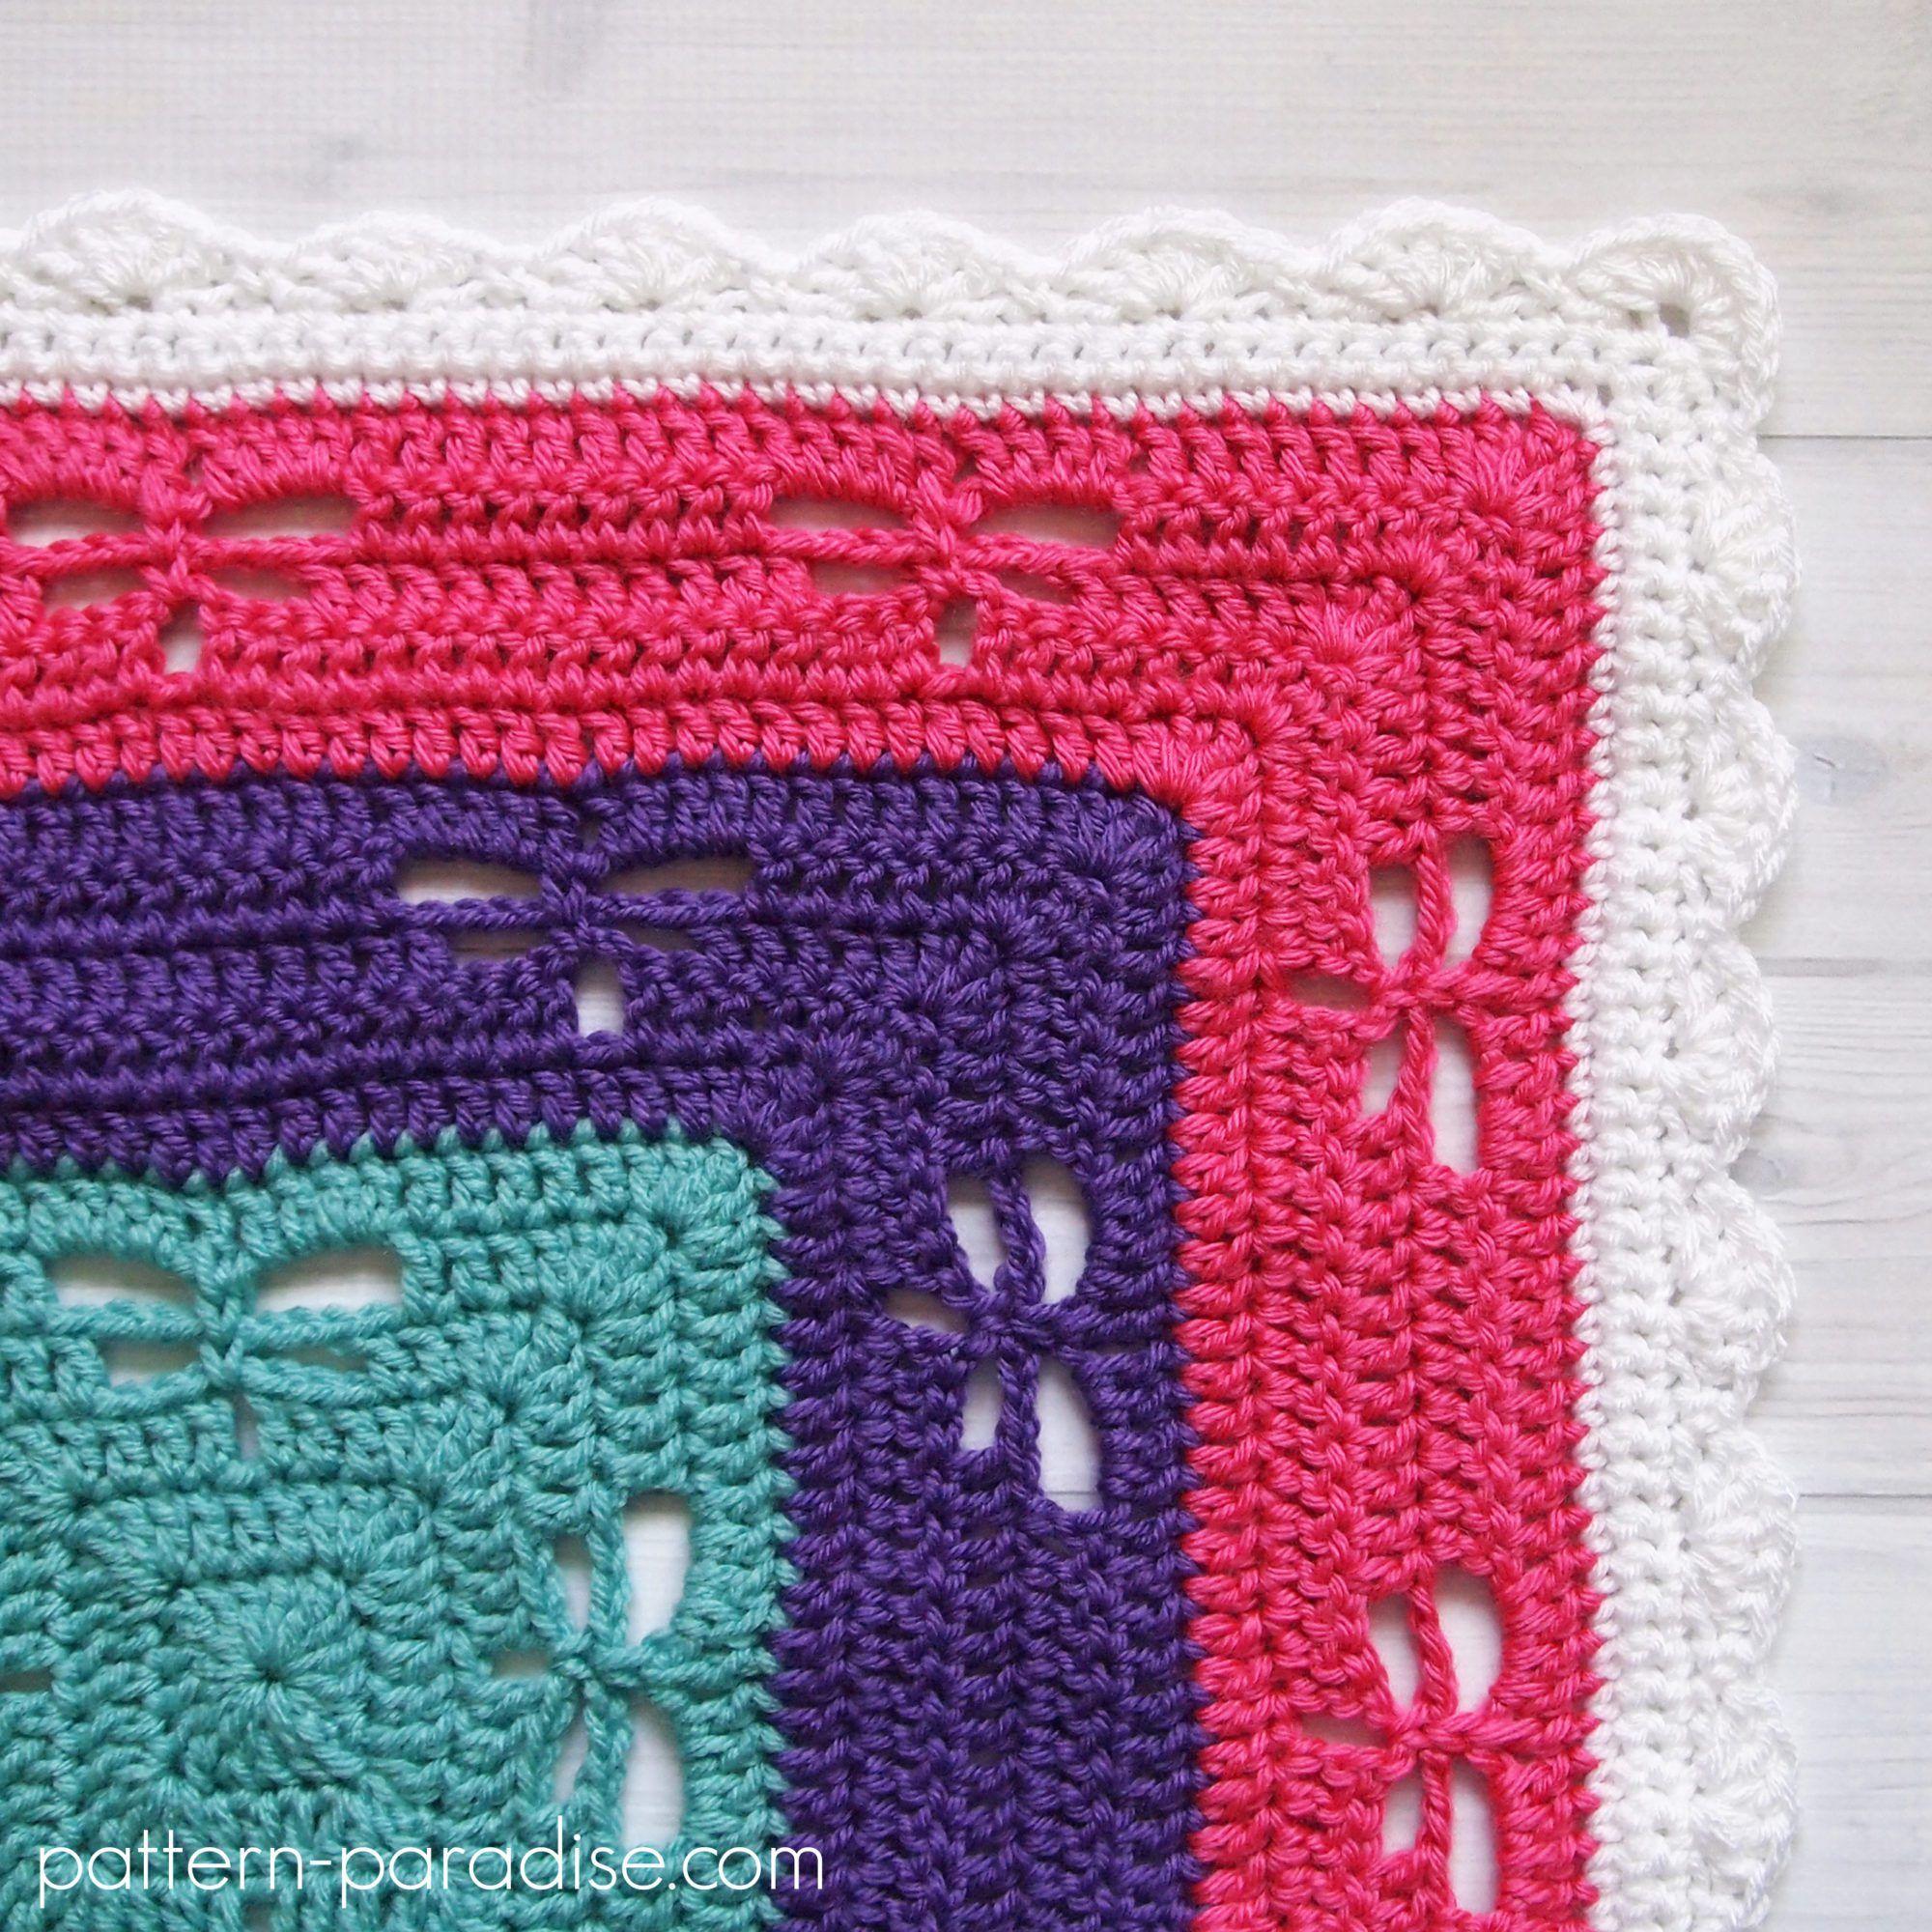 Free Crochet Pattern: Radiating Dragonflies Throw | Baby crochet ...